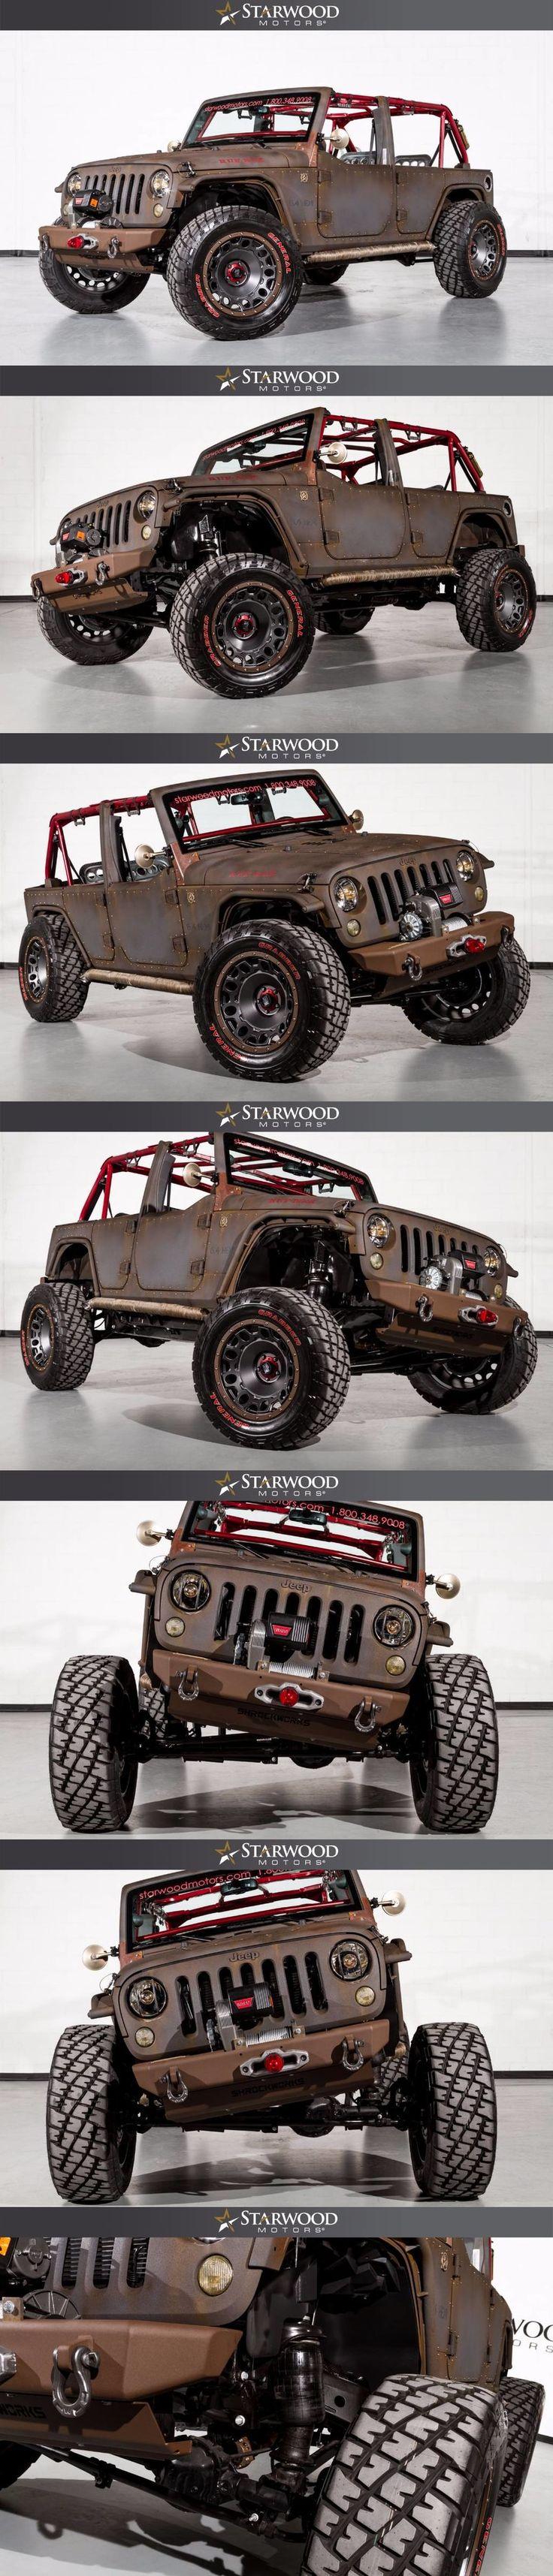 Starwood Motors WWII-themed Ruf-Nek 2015 SEMA Custom Jeep Wrangler with 6.4-Liter HEMI V8 conversion  #starwoodmotors #Jeep #JeepWrangler #RufNek #SEMA #JeepMods #CustomJeep #JeepLife #oIIIIIIIo